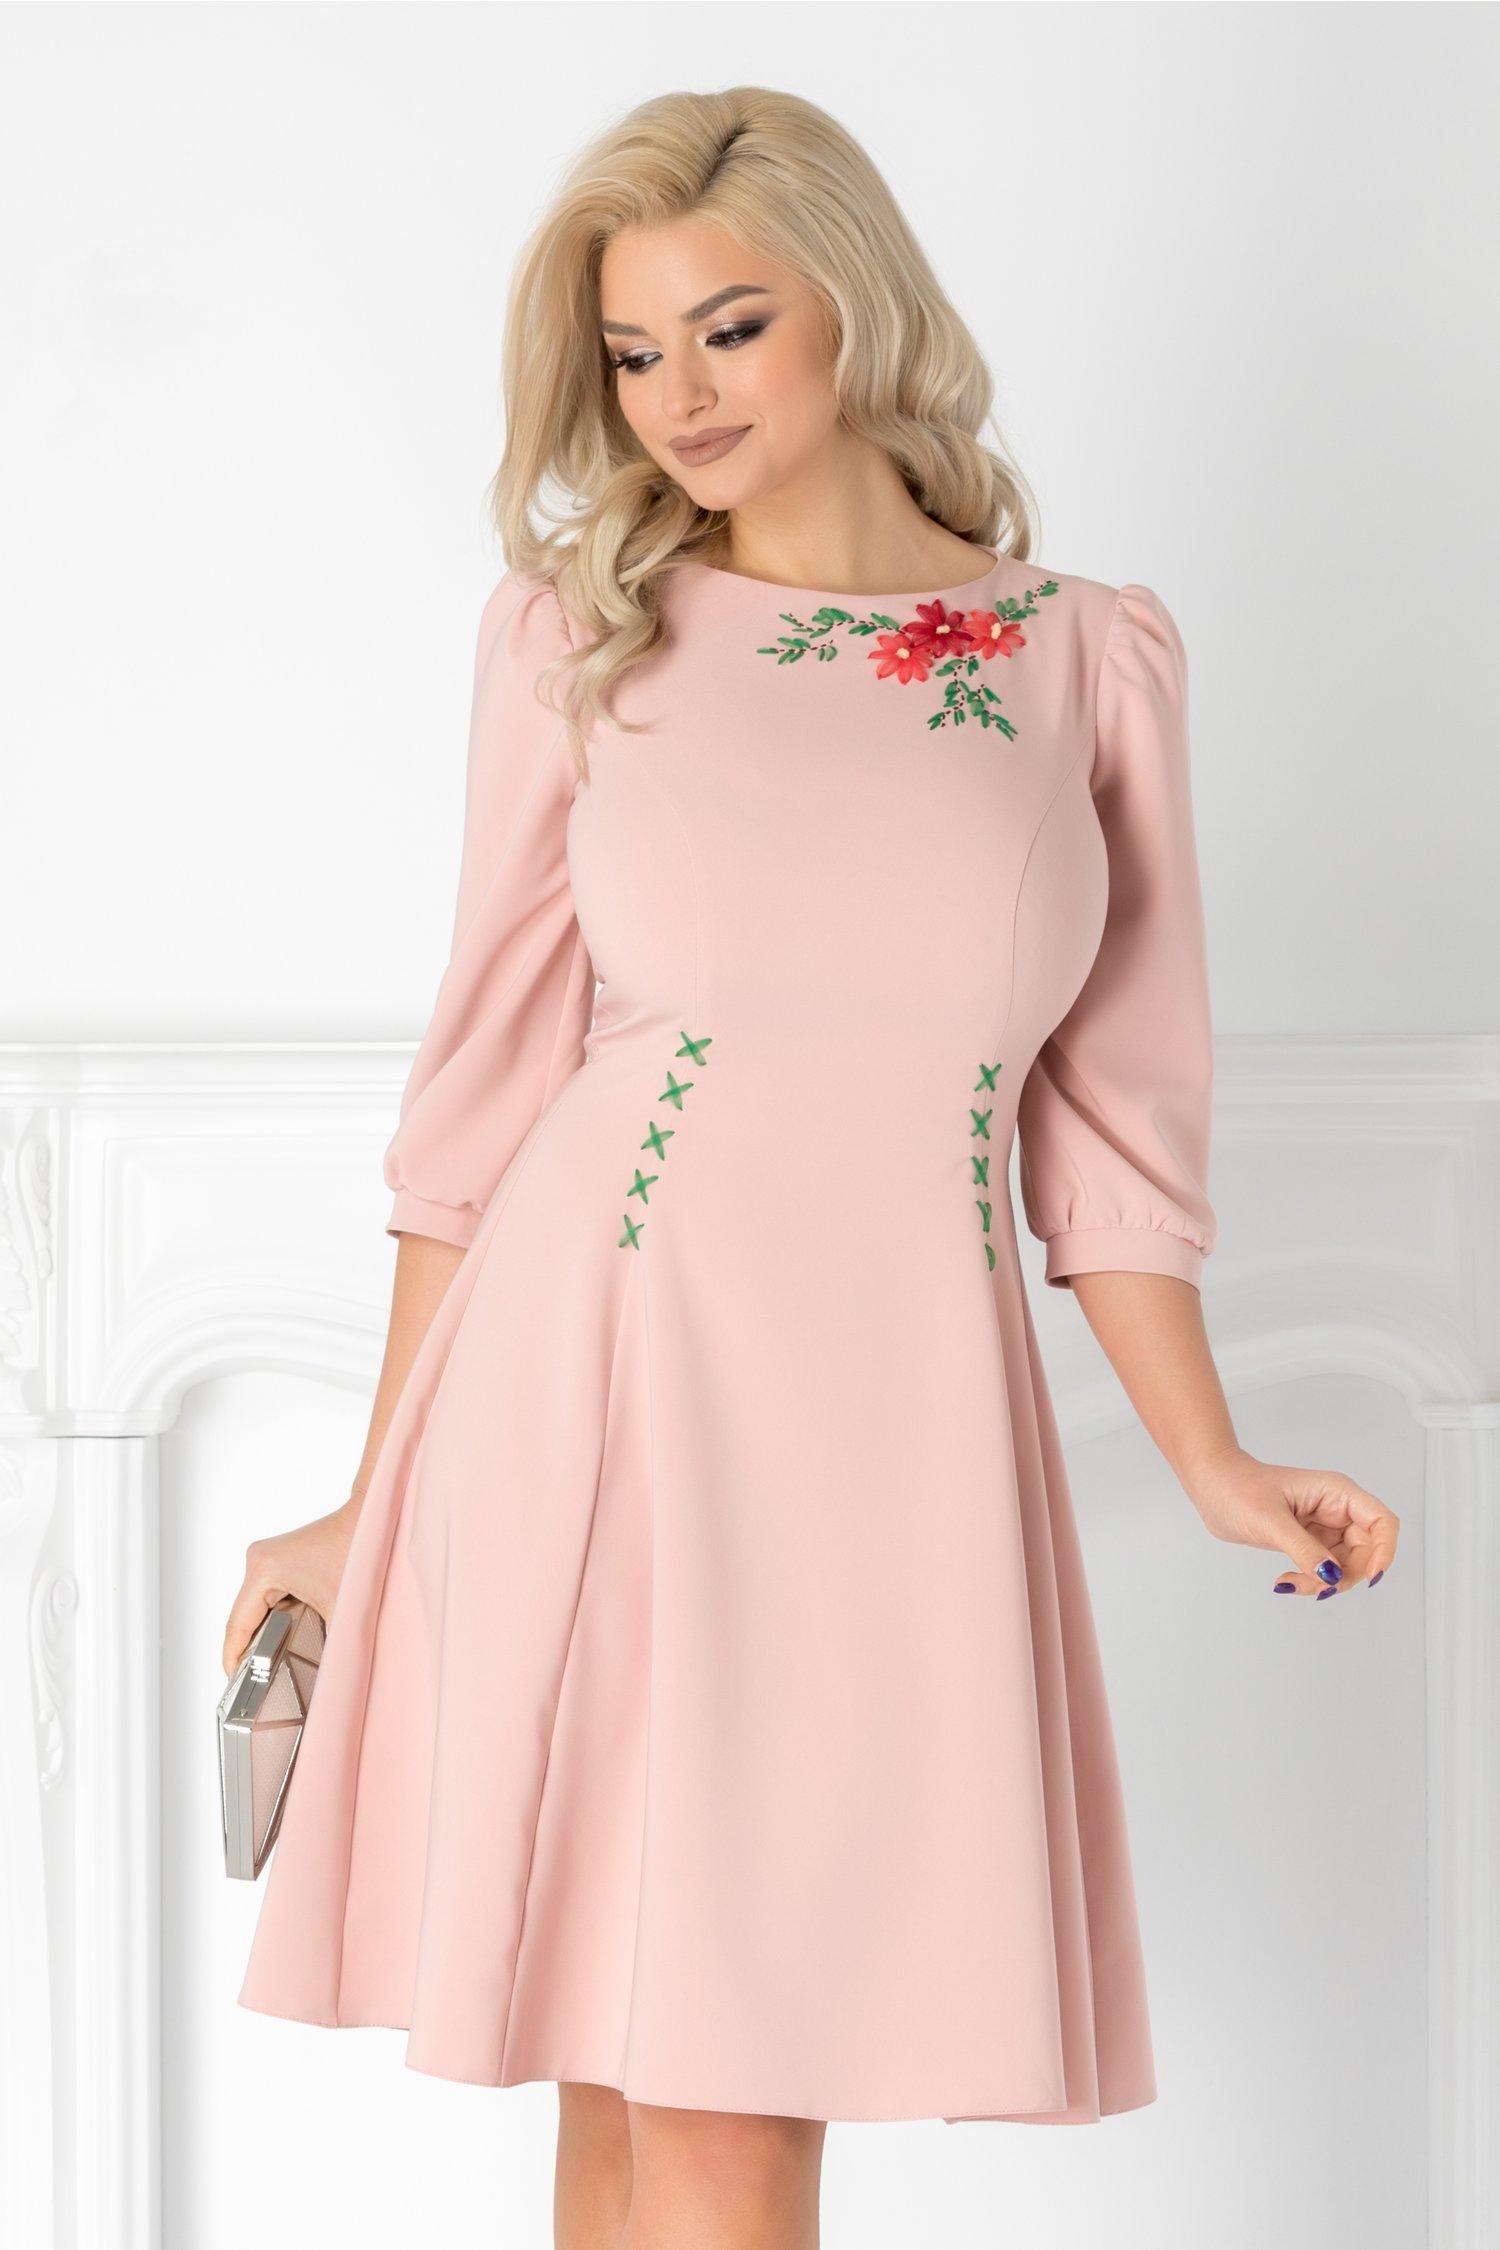 Rochie LaDonna roz cu broderie florala handmade